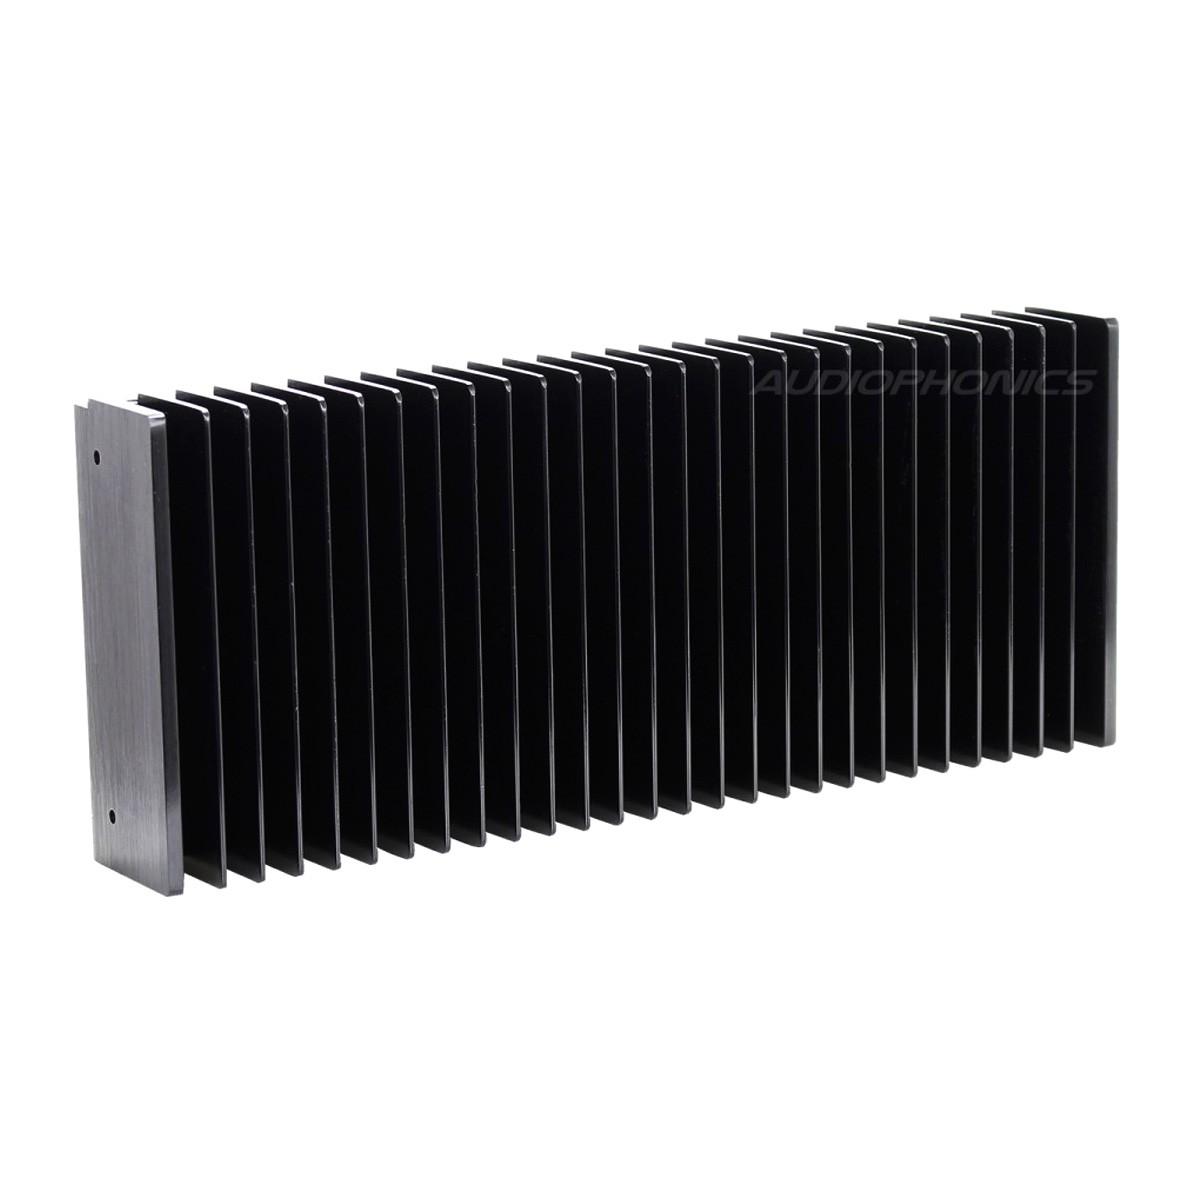 Anodized Heatsink Radiator 400x115x50mm Black